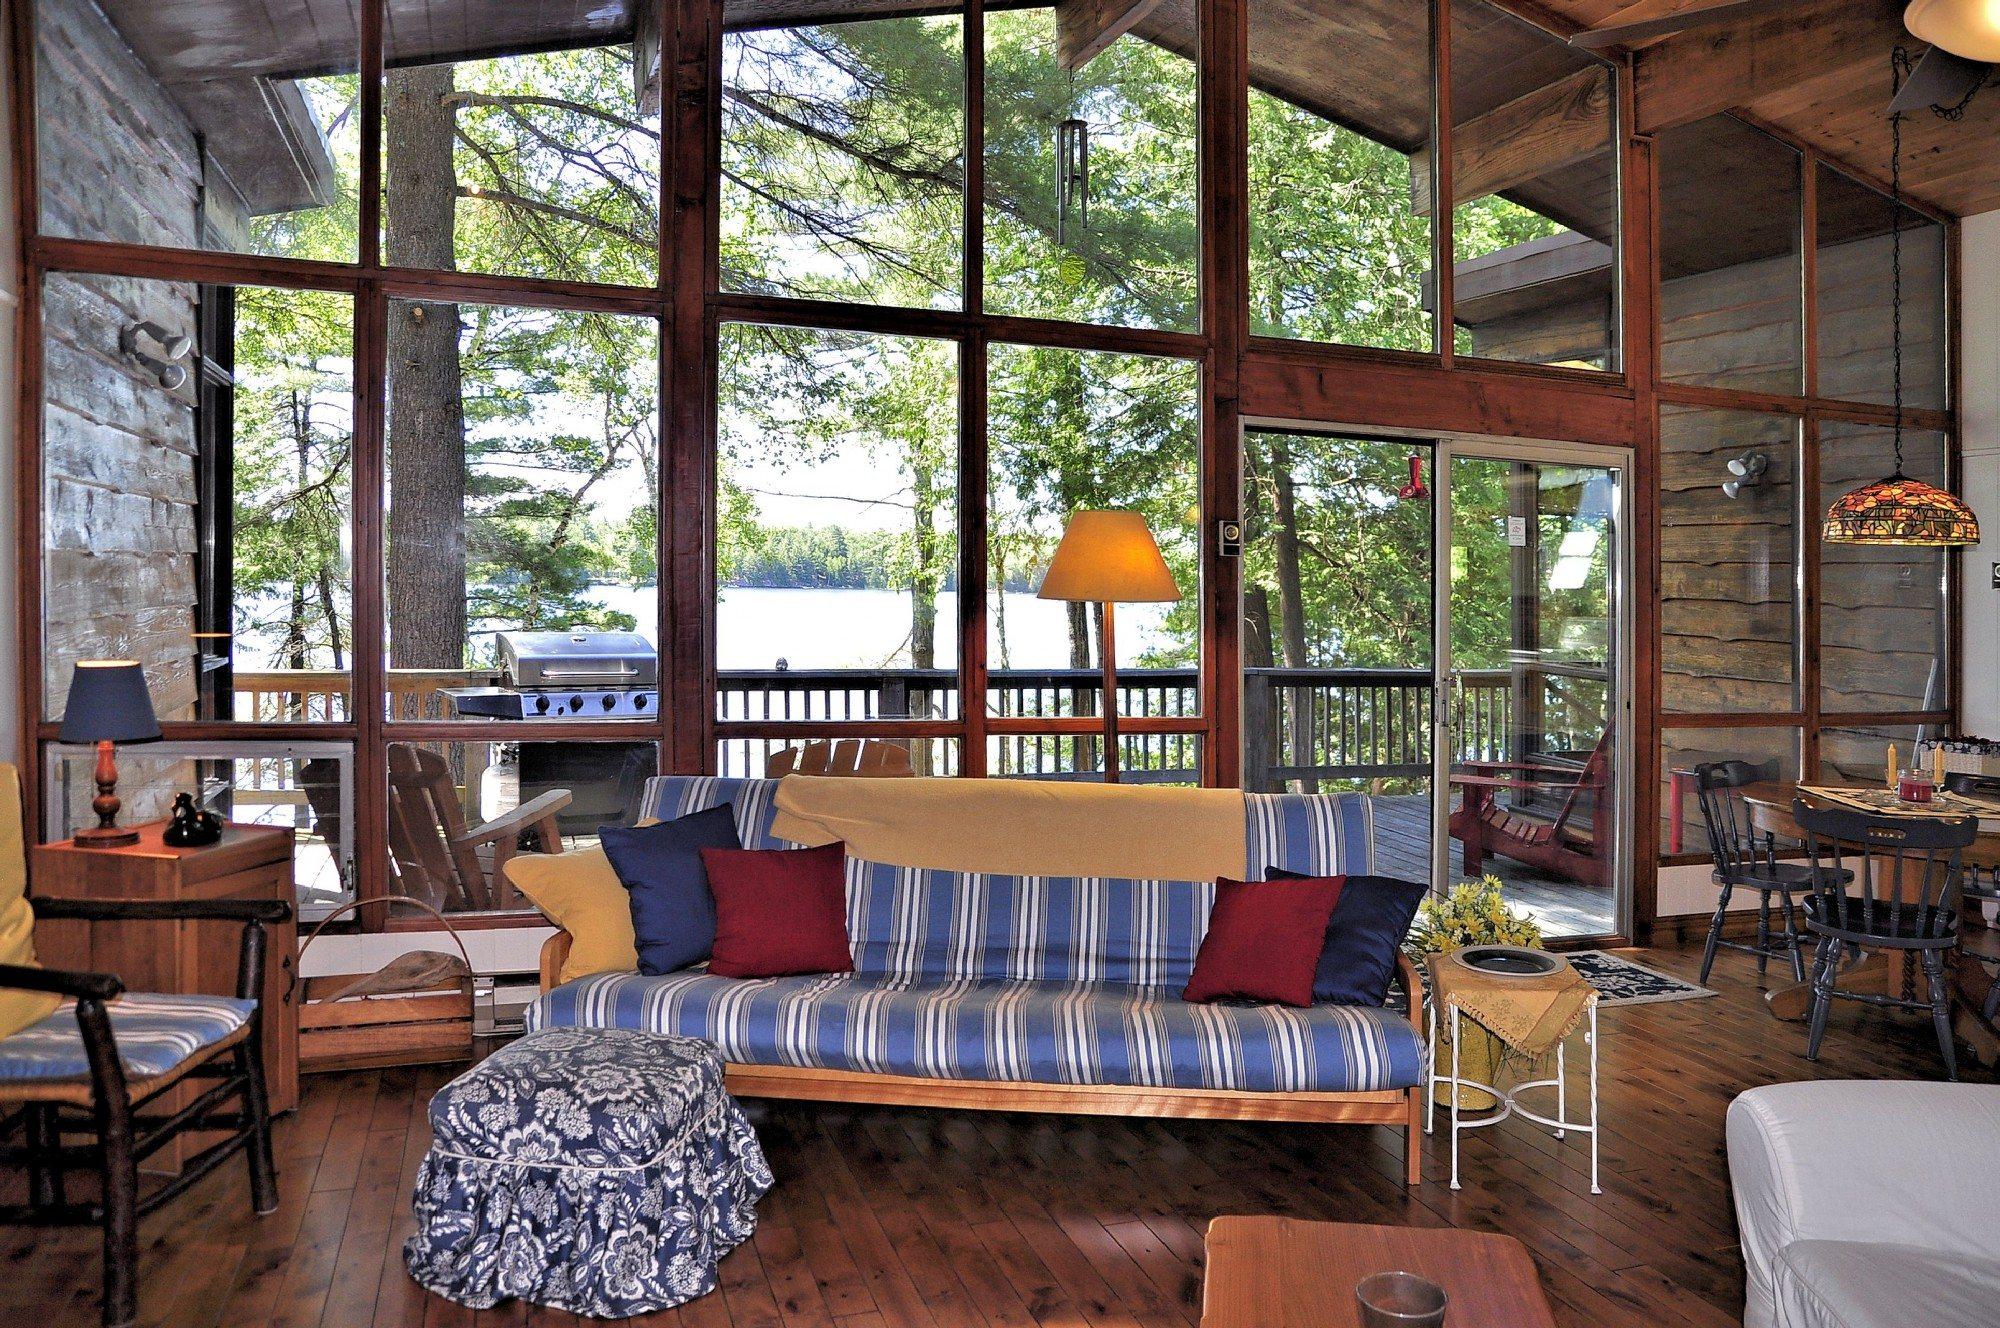 kawartha-lakes-cottage-for-sale-315-crego-lake-road-4